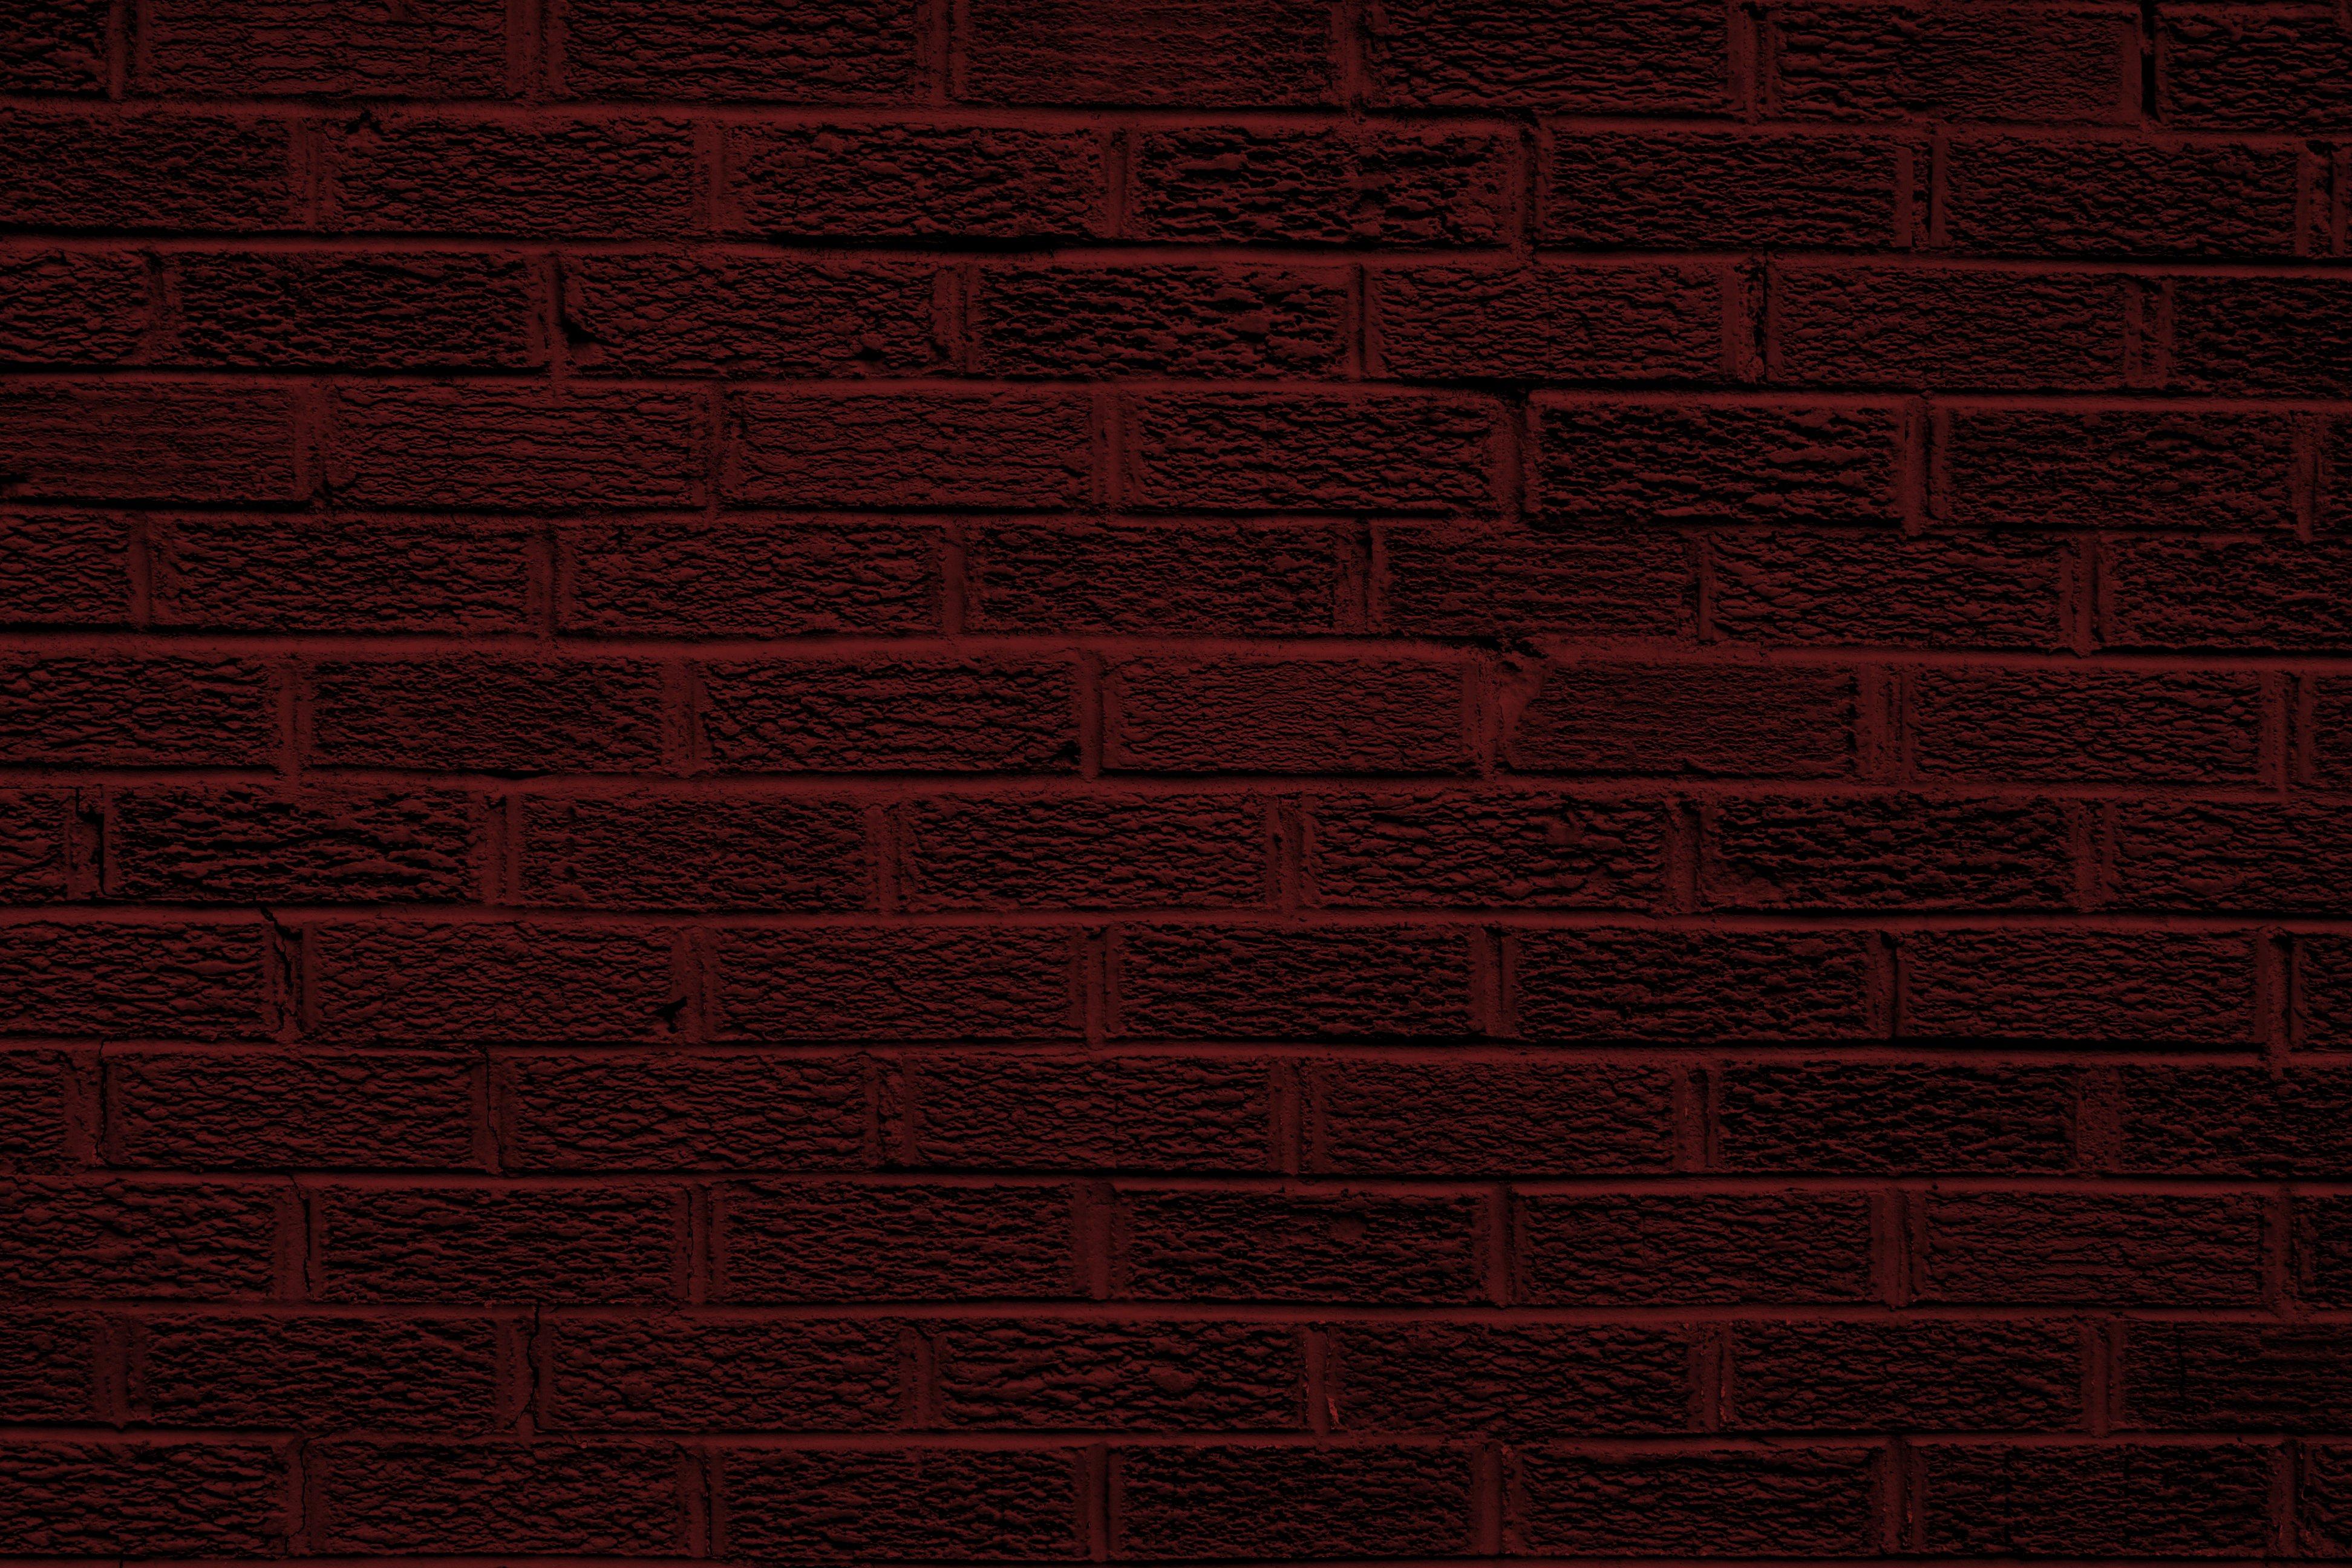 50 dark maroon wallpaper on wallpapersafari dark maroon wallpaper on wallpapersafari